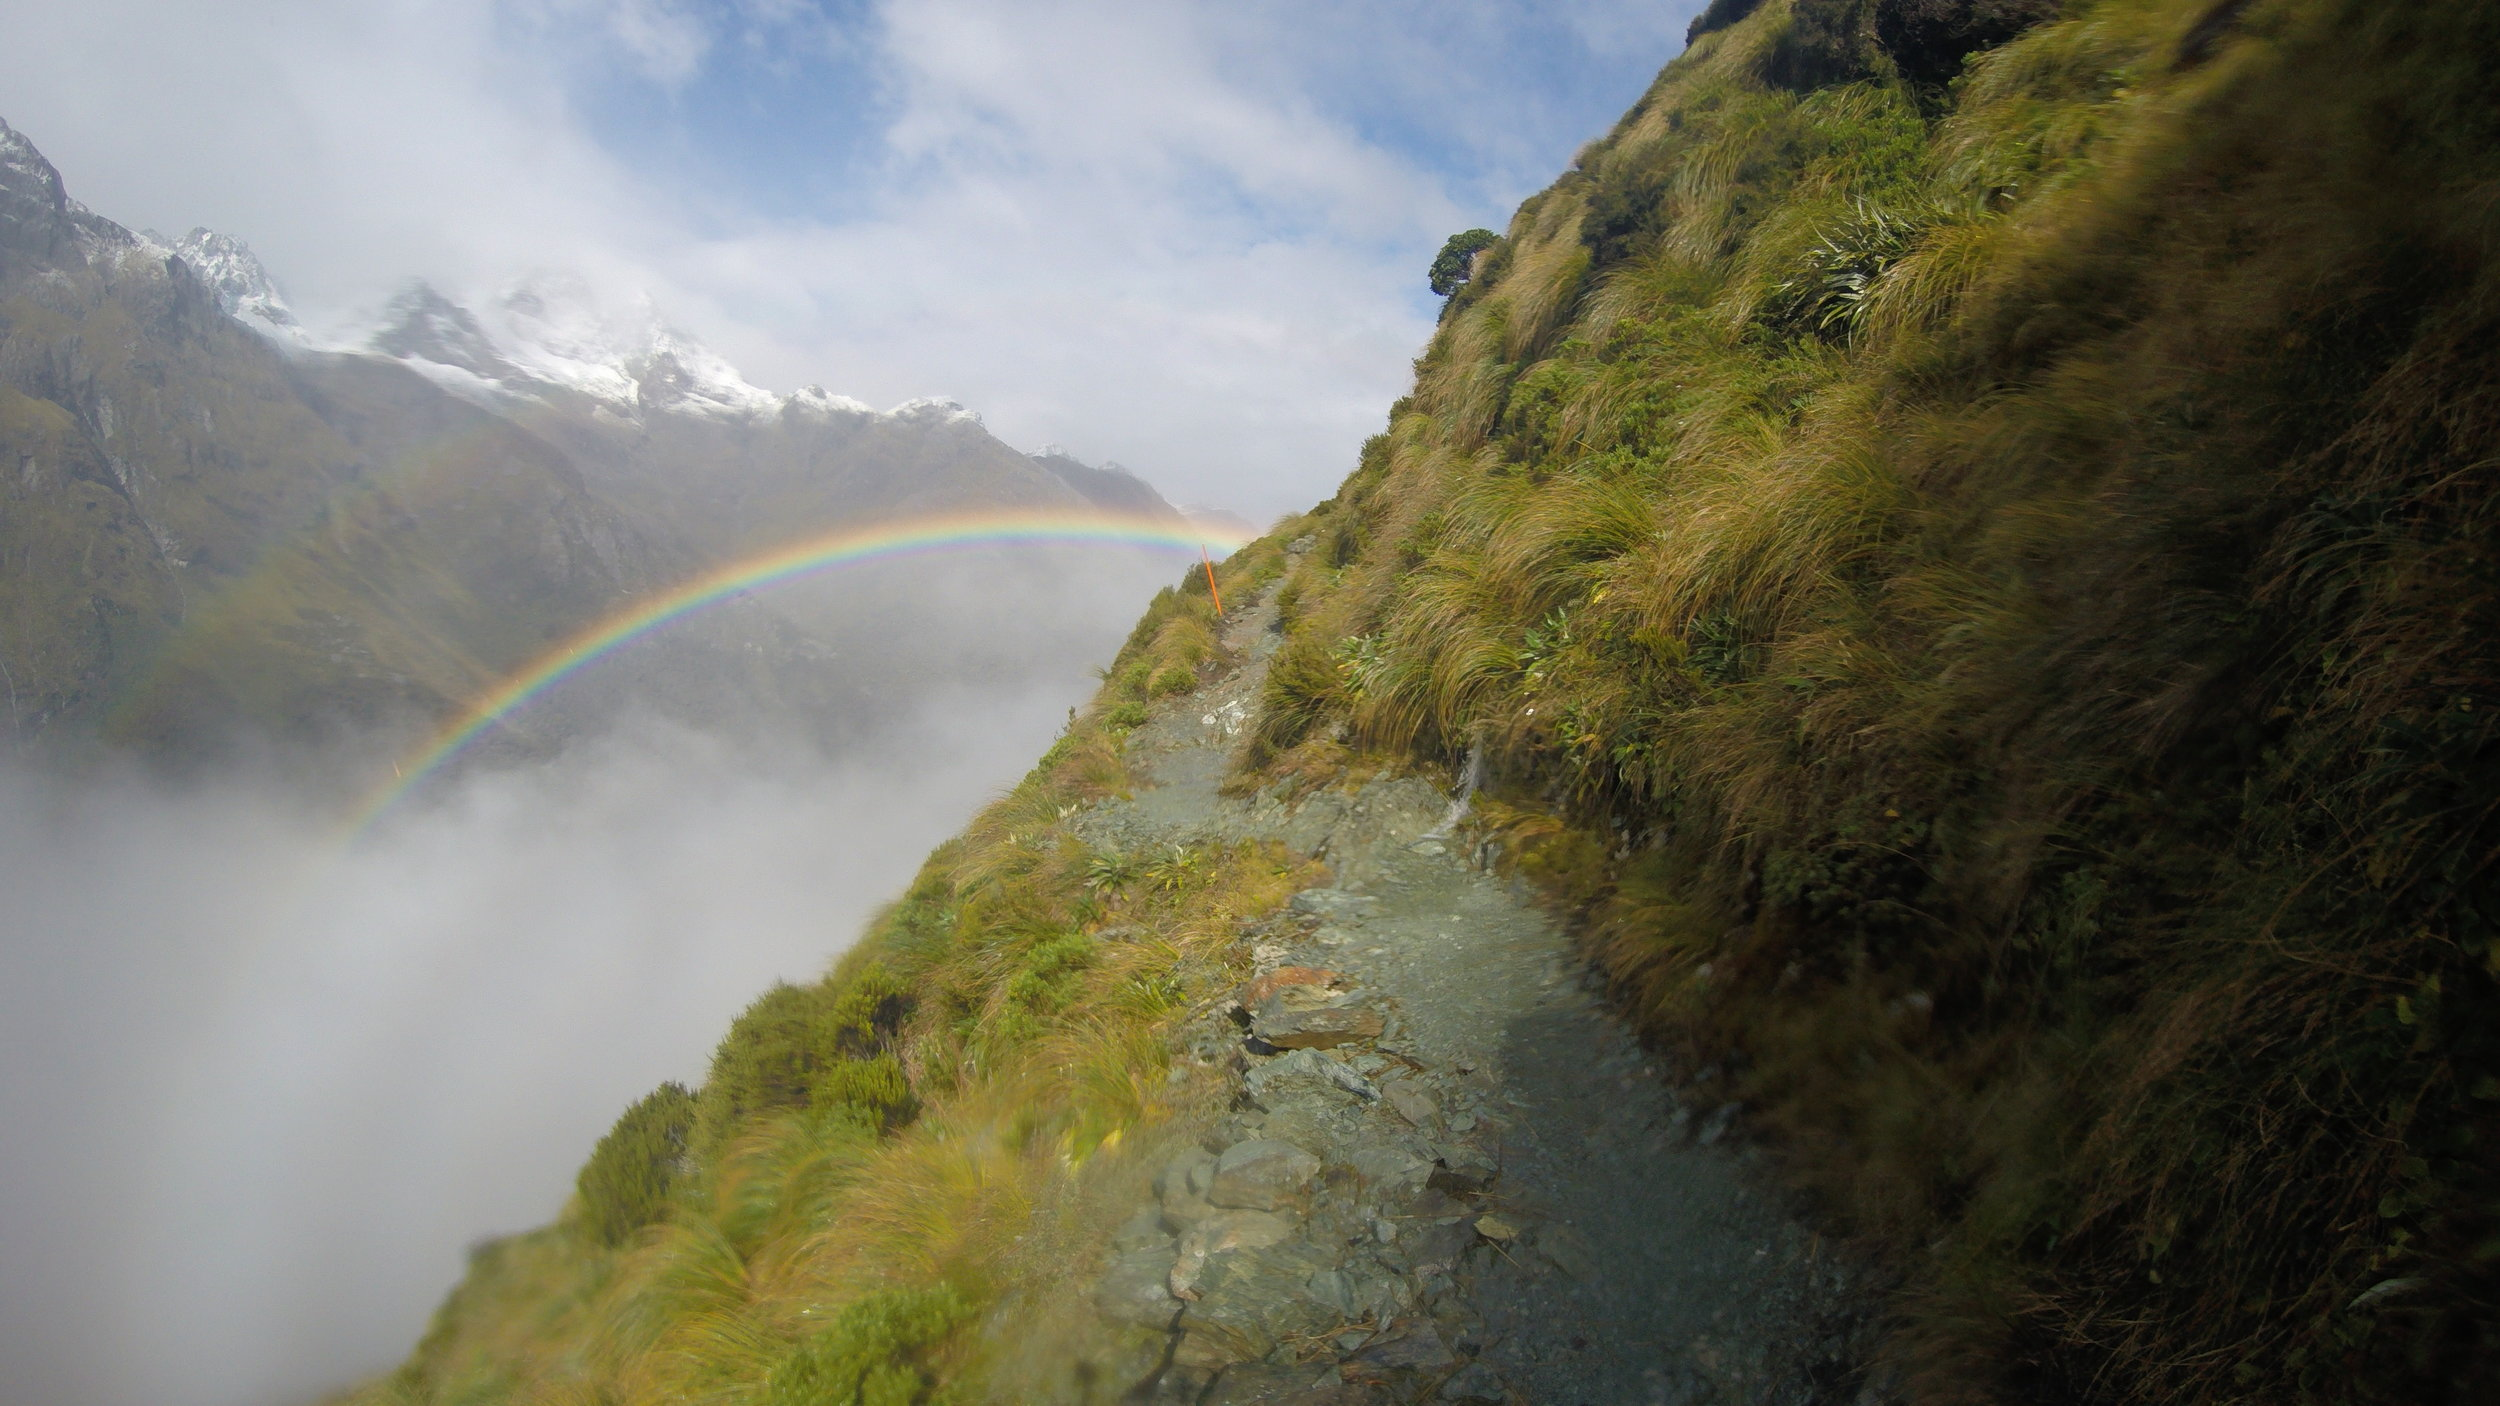 Routeburn rainbow